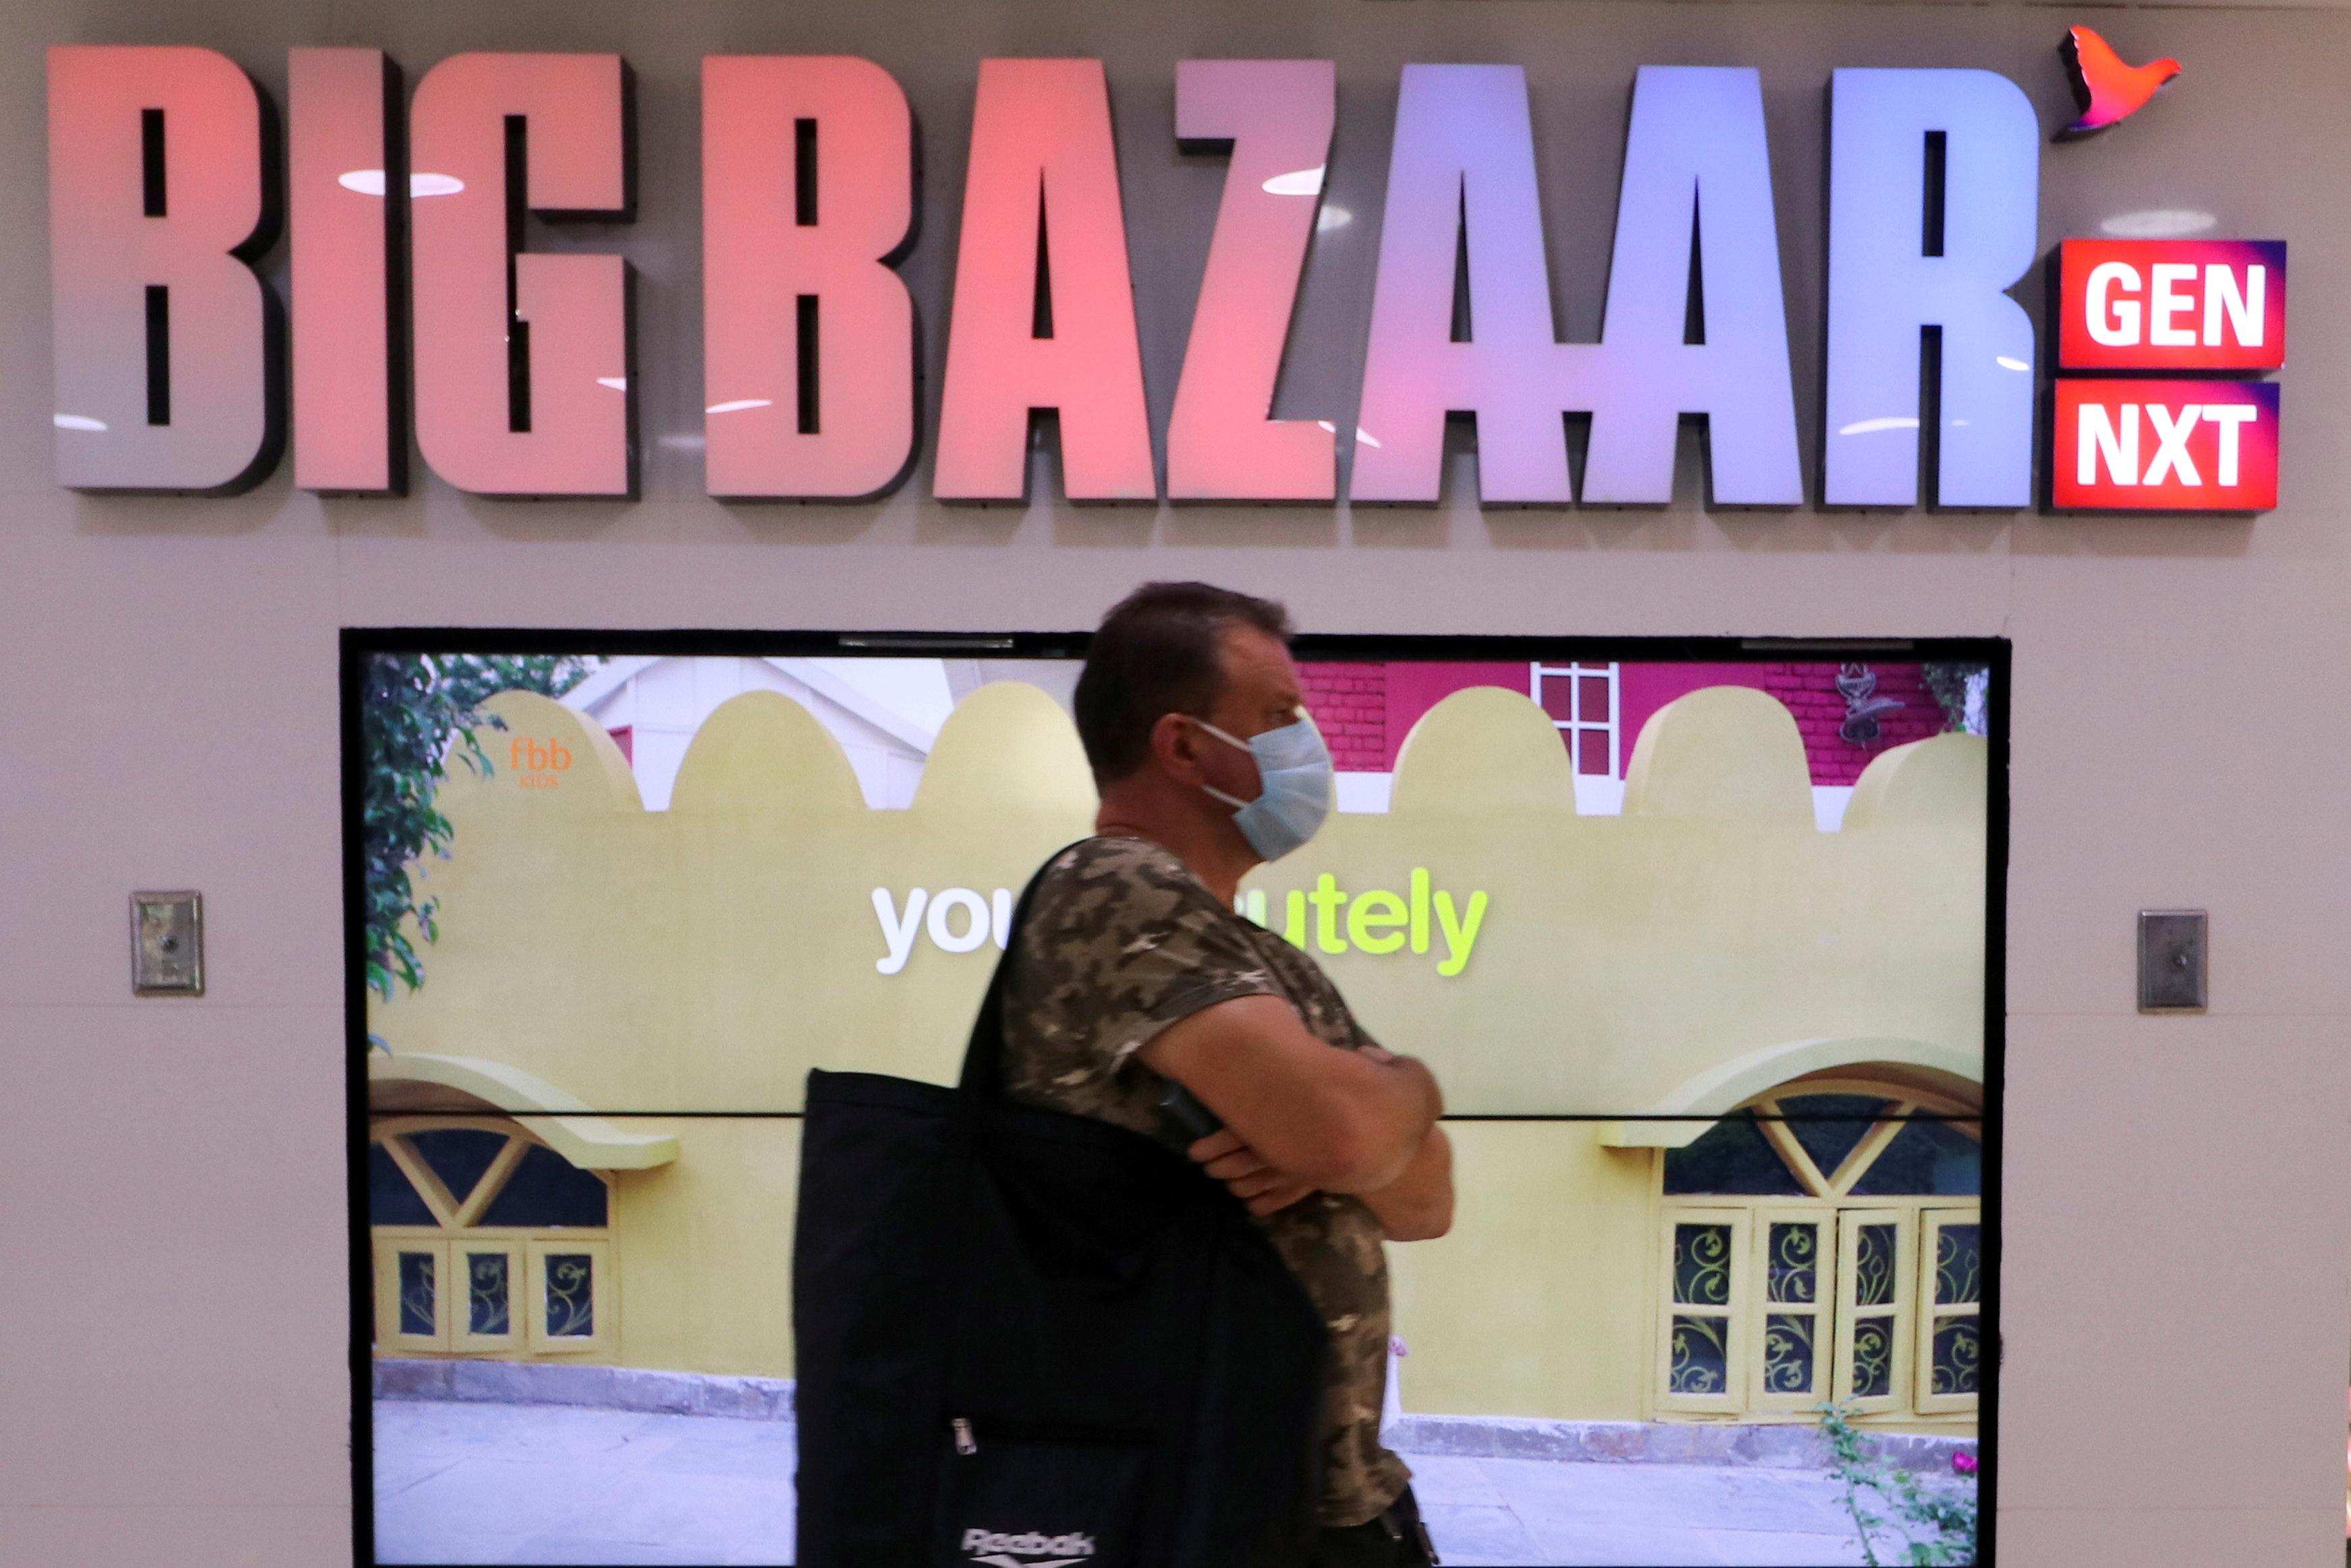 A man walks inside the Big Bazaar retail store in Mumbai, India, November 25, 2020. REUTERS/Niharika Kulkarni/File Photo